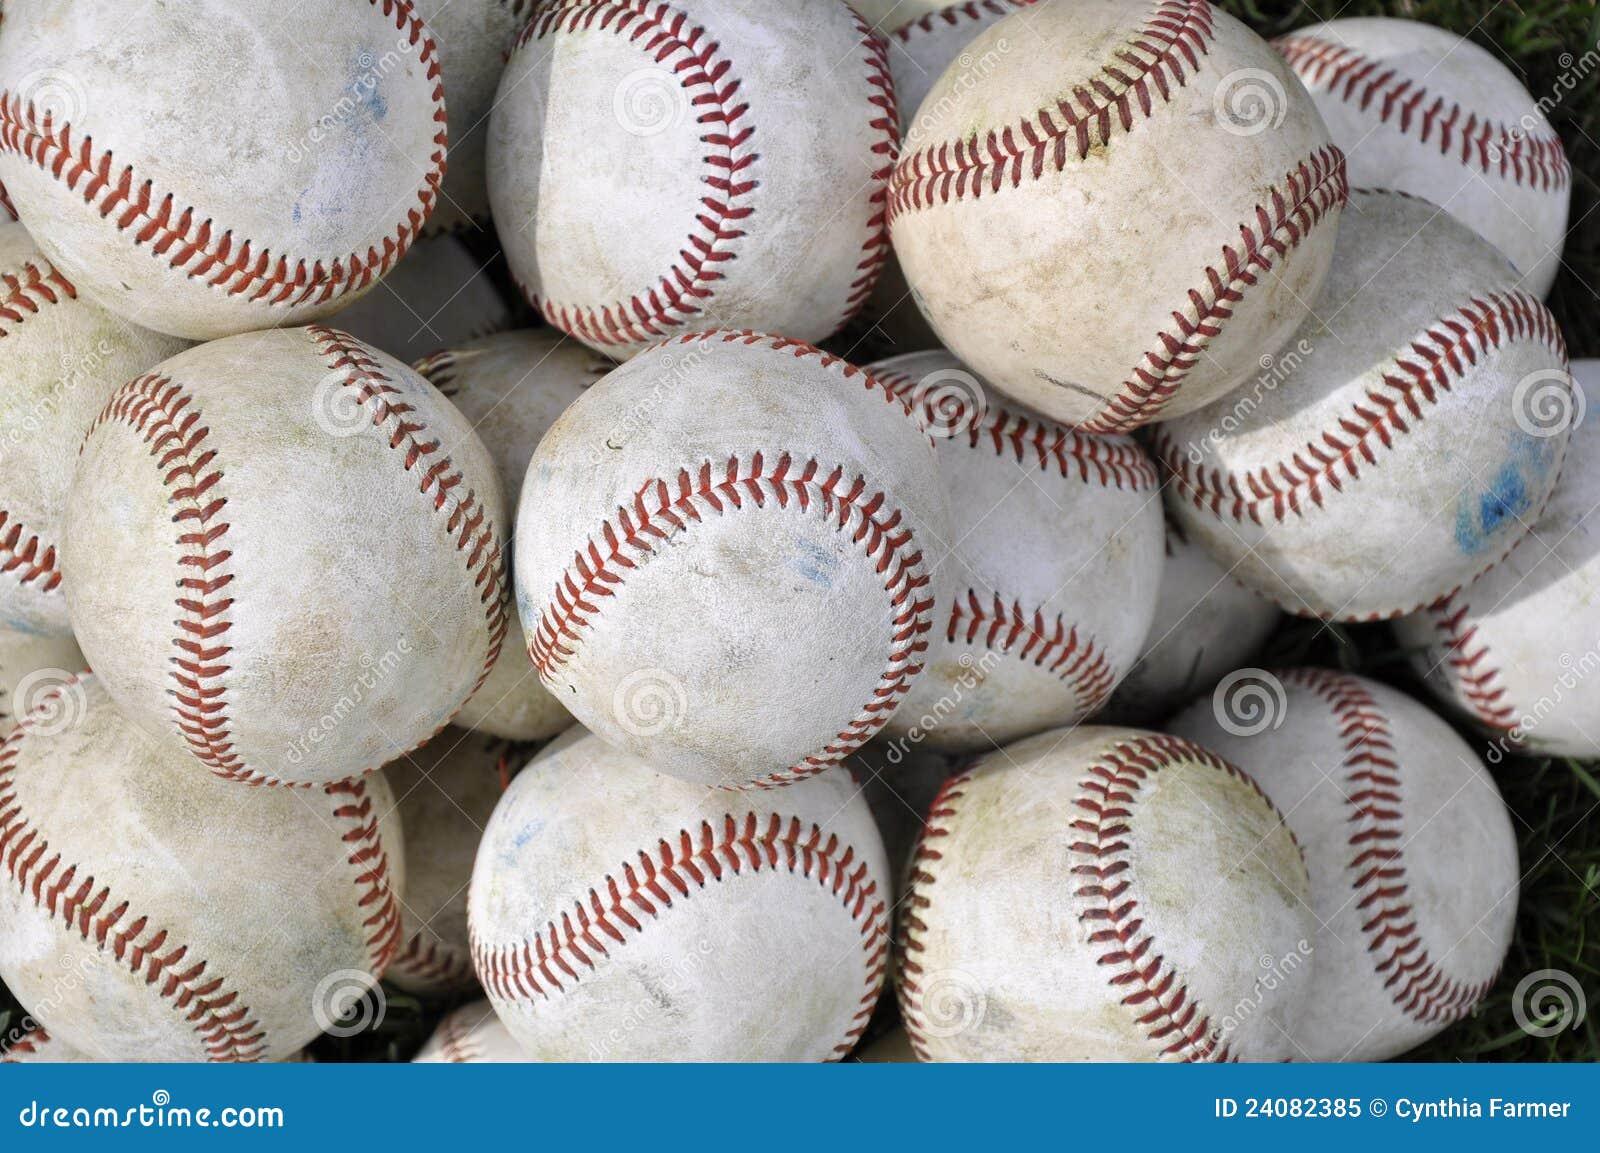 Pile Of Old Baseballs Royalty Free Stock Photo Image